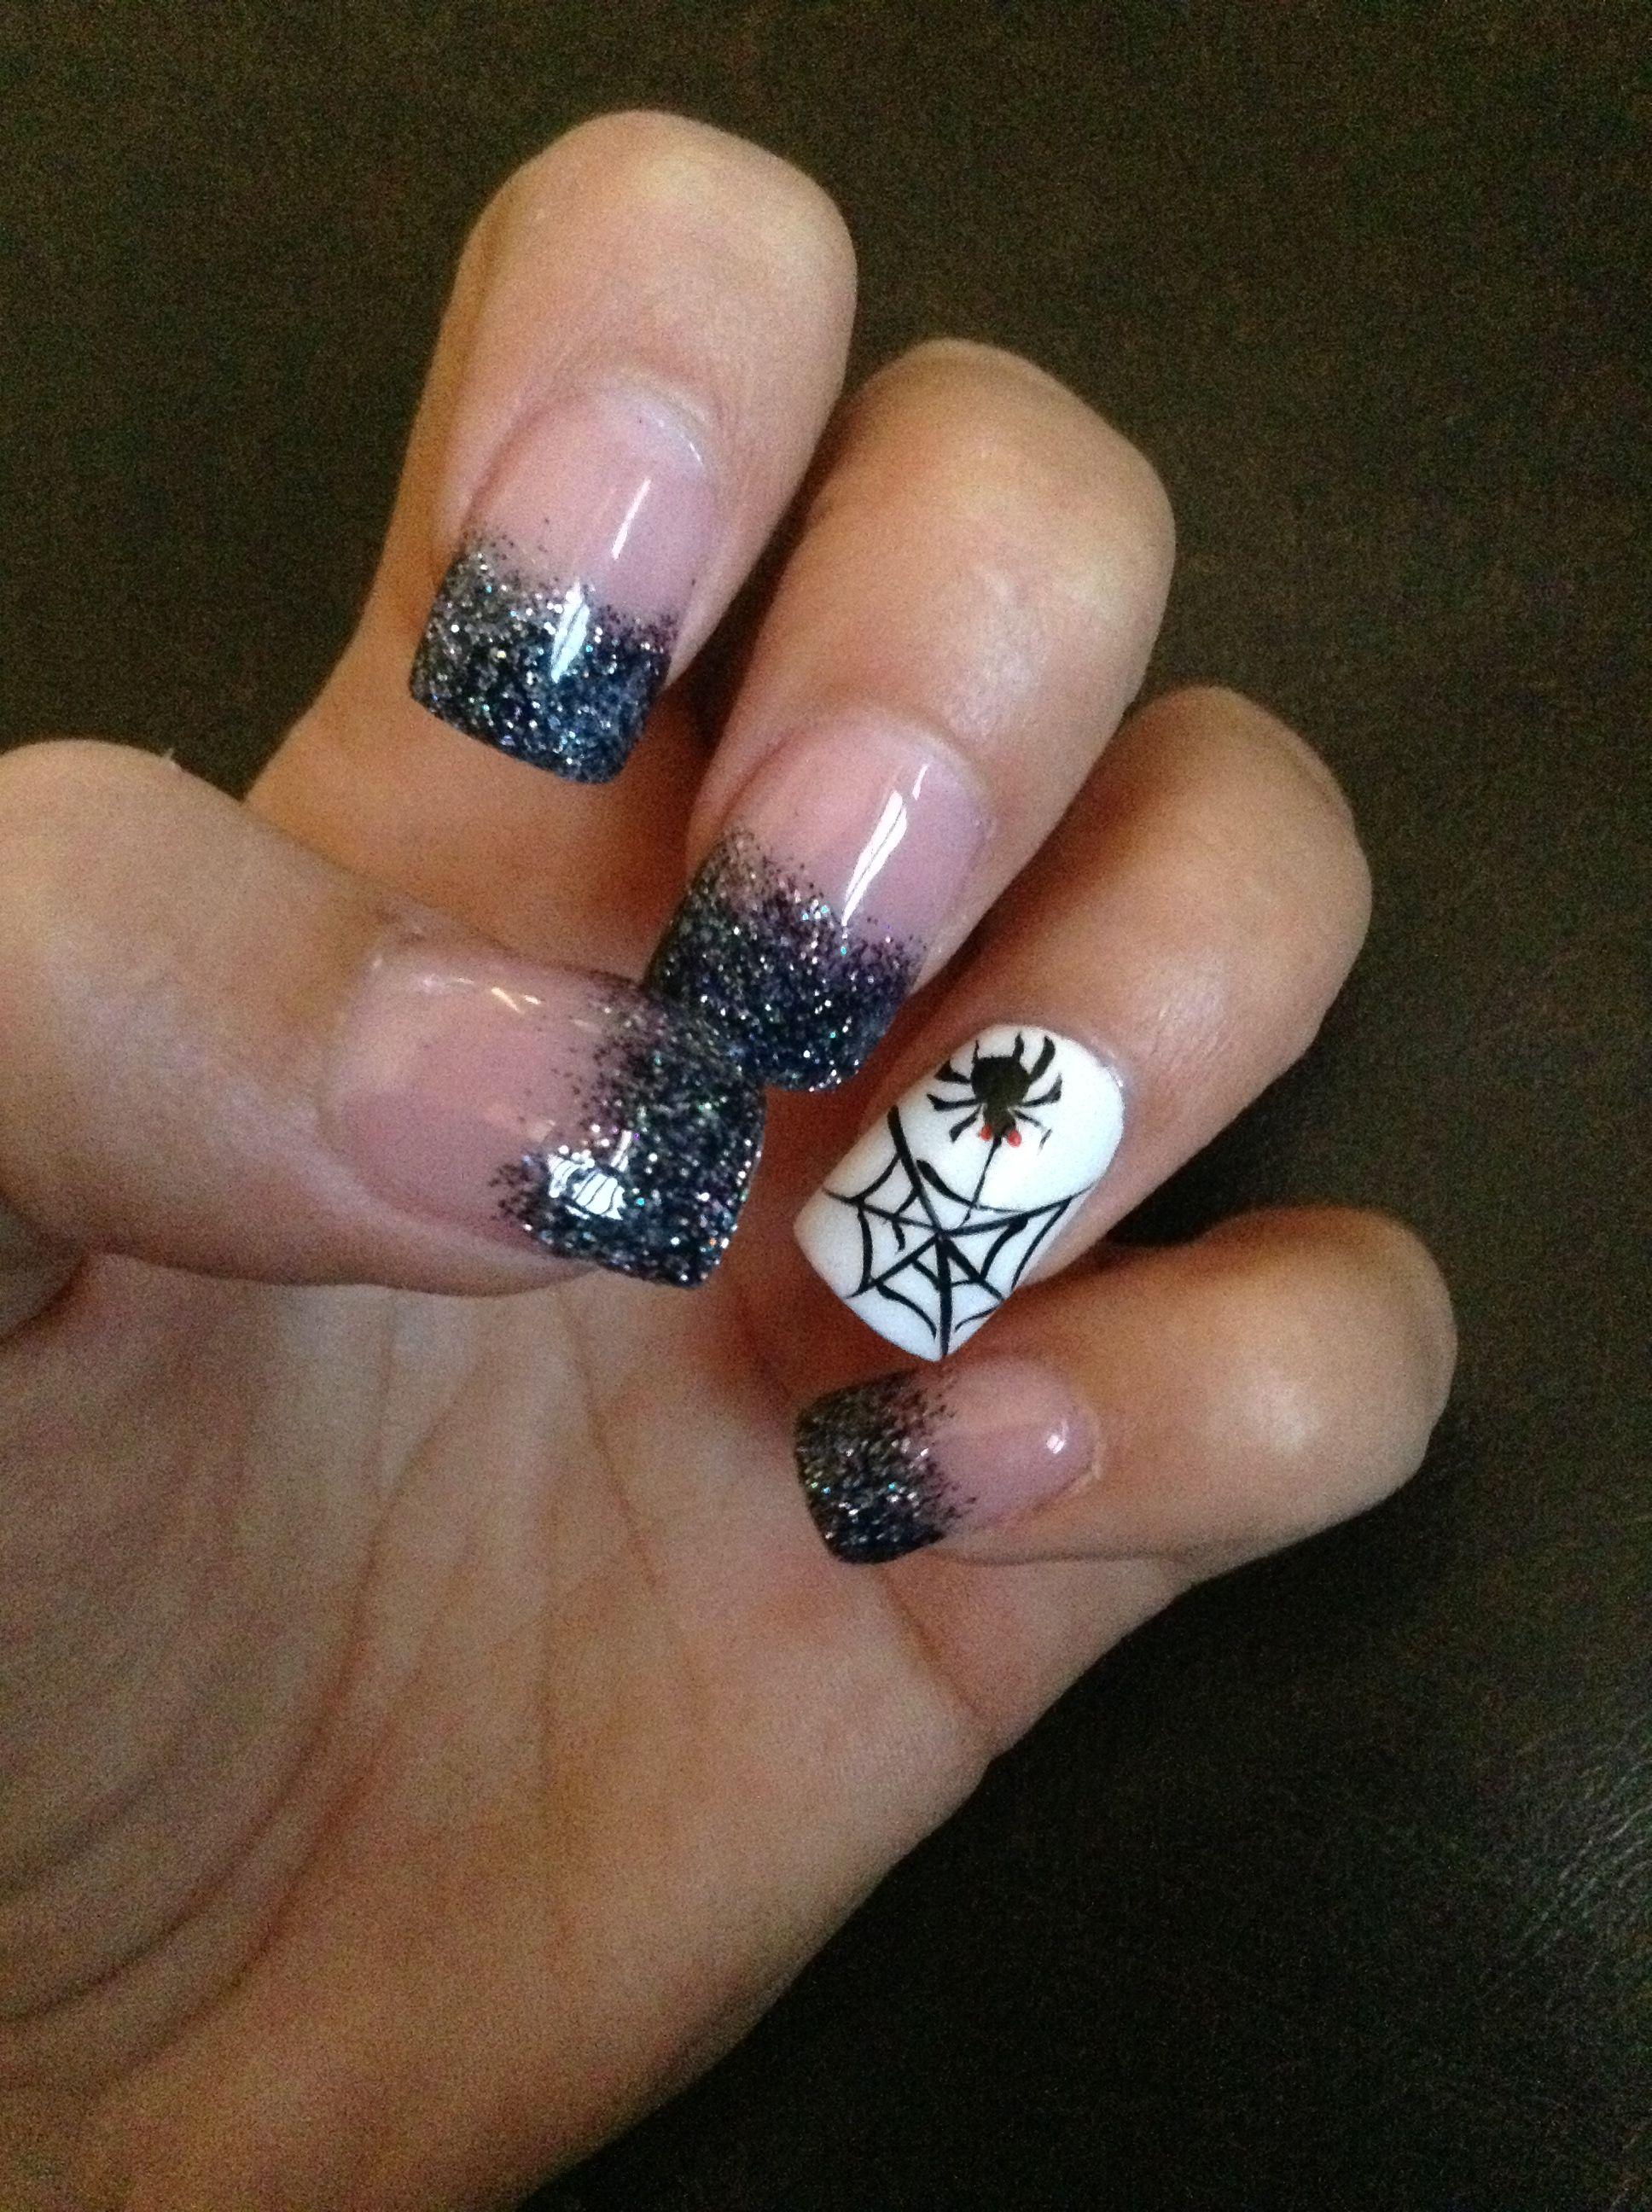 Halloween Nail Art Halloween Nails Easy Halloween Nail Art Halloween Nail Designs